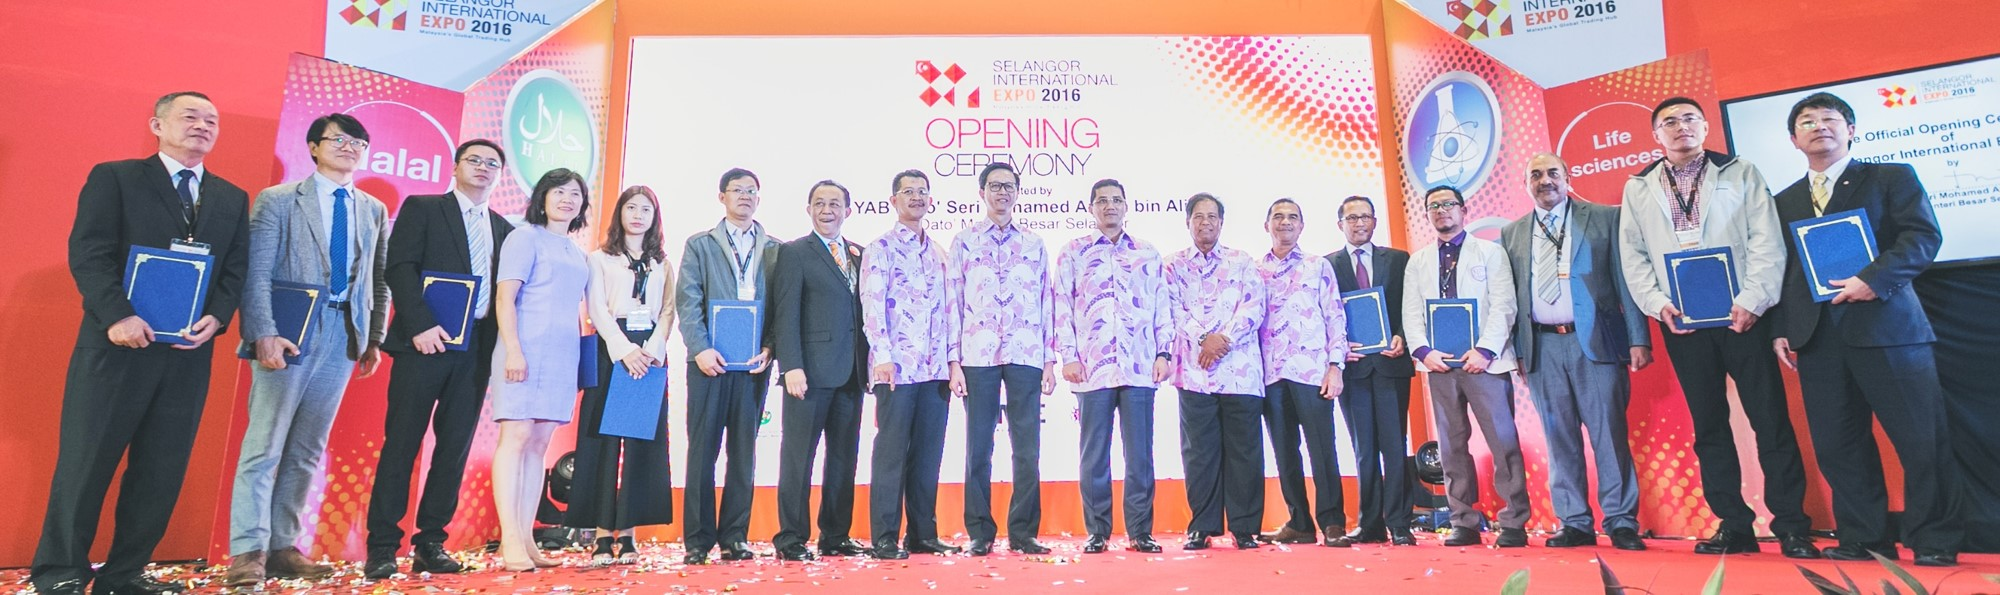 HIS Selangor International EXPO 2016 195